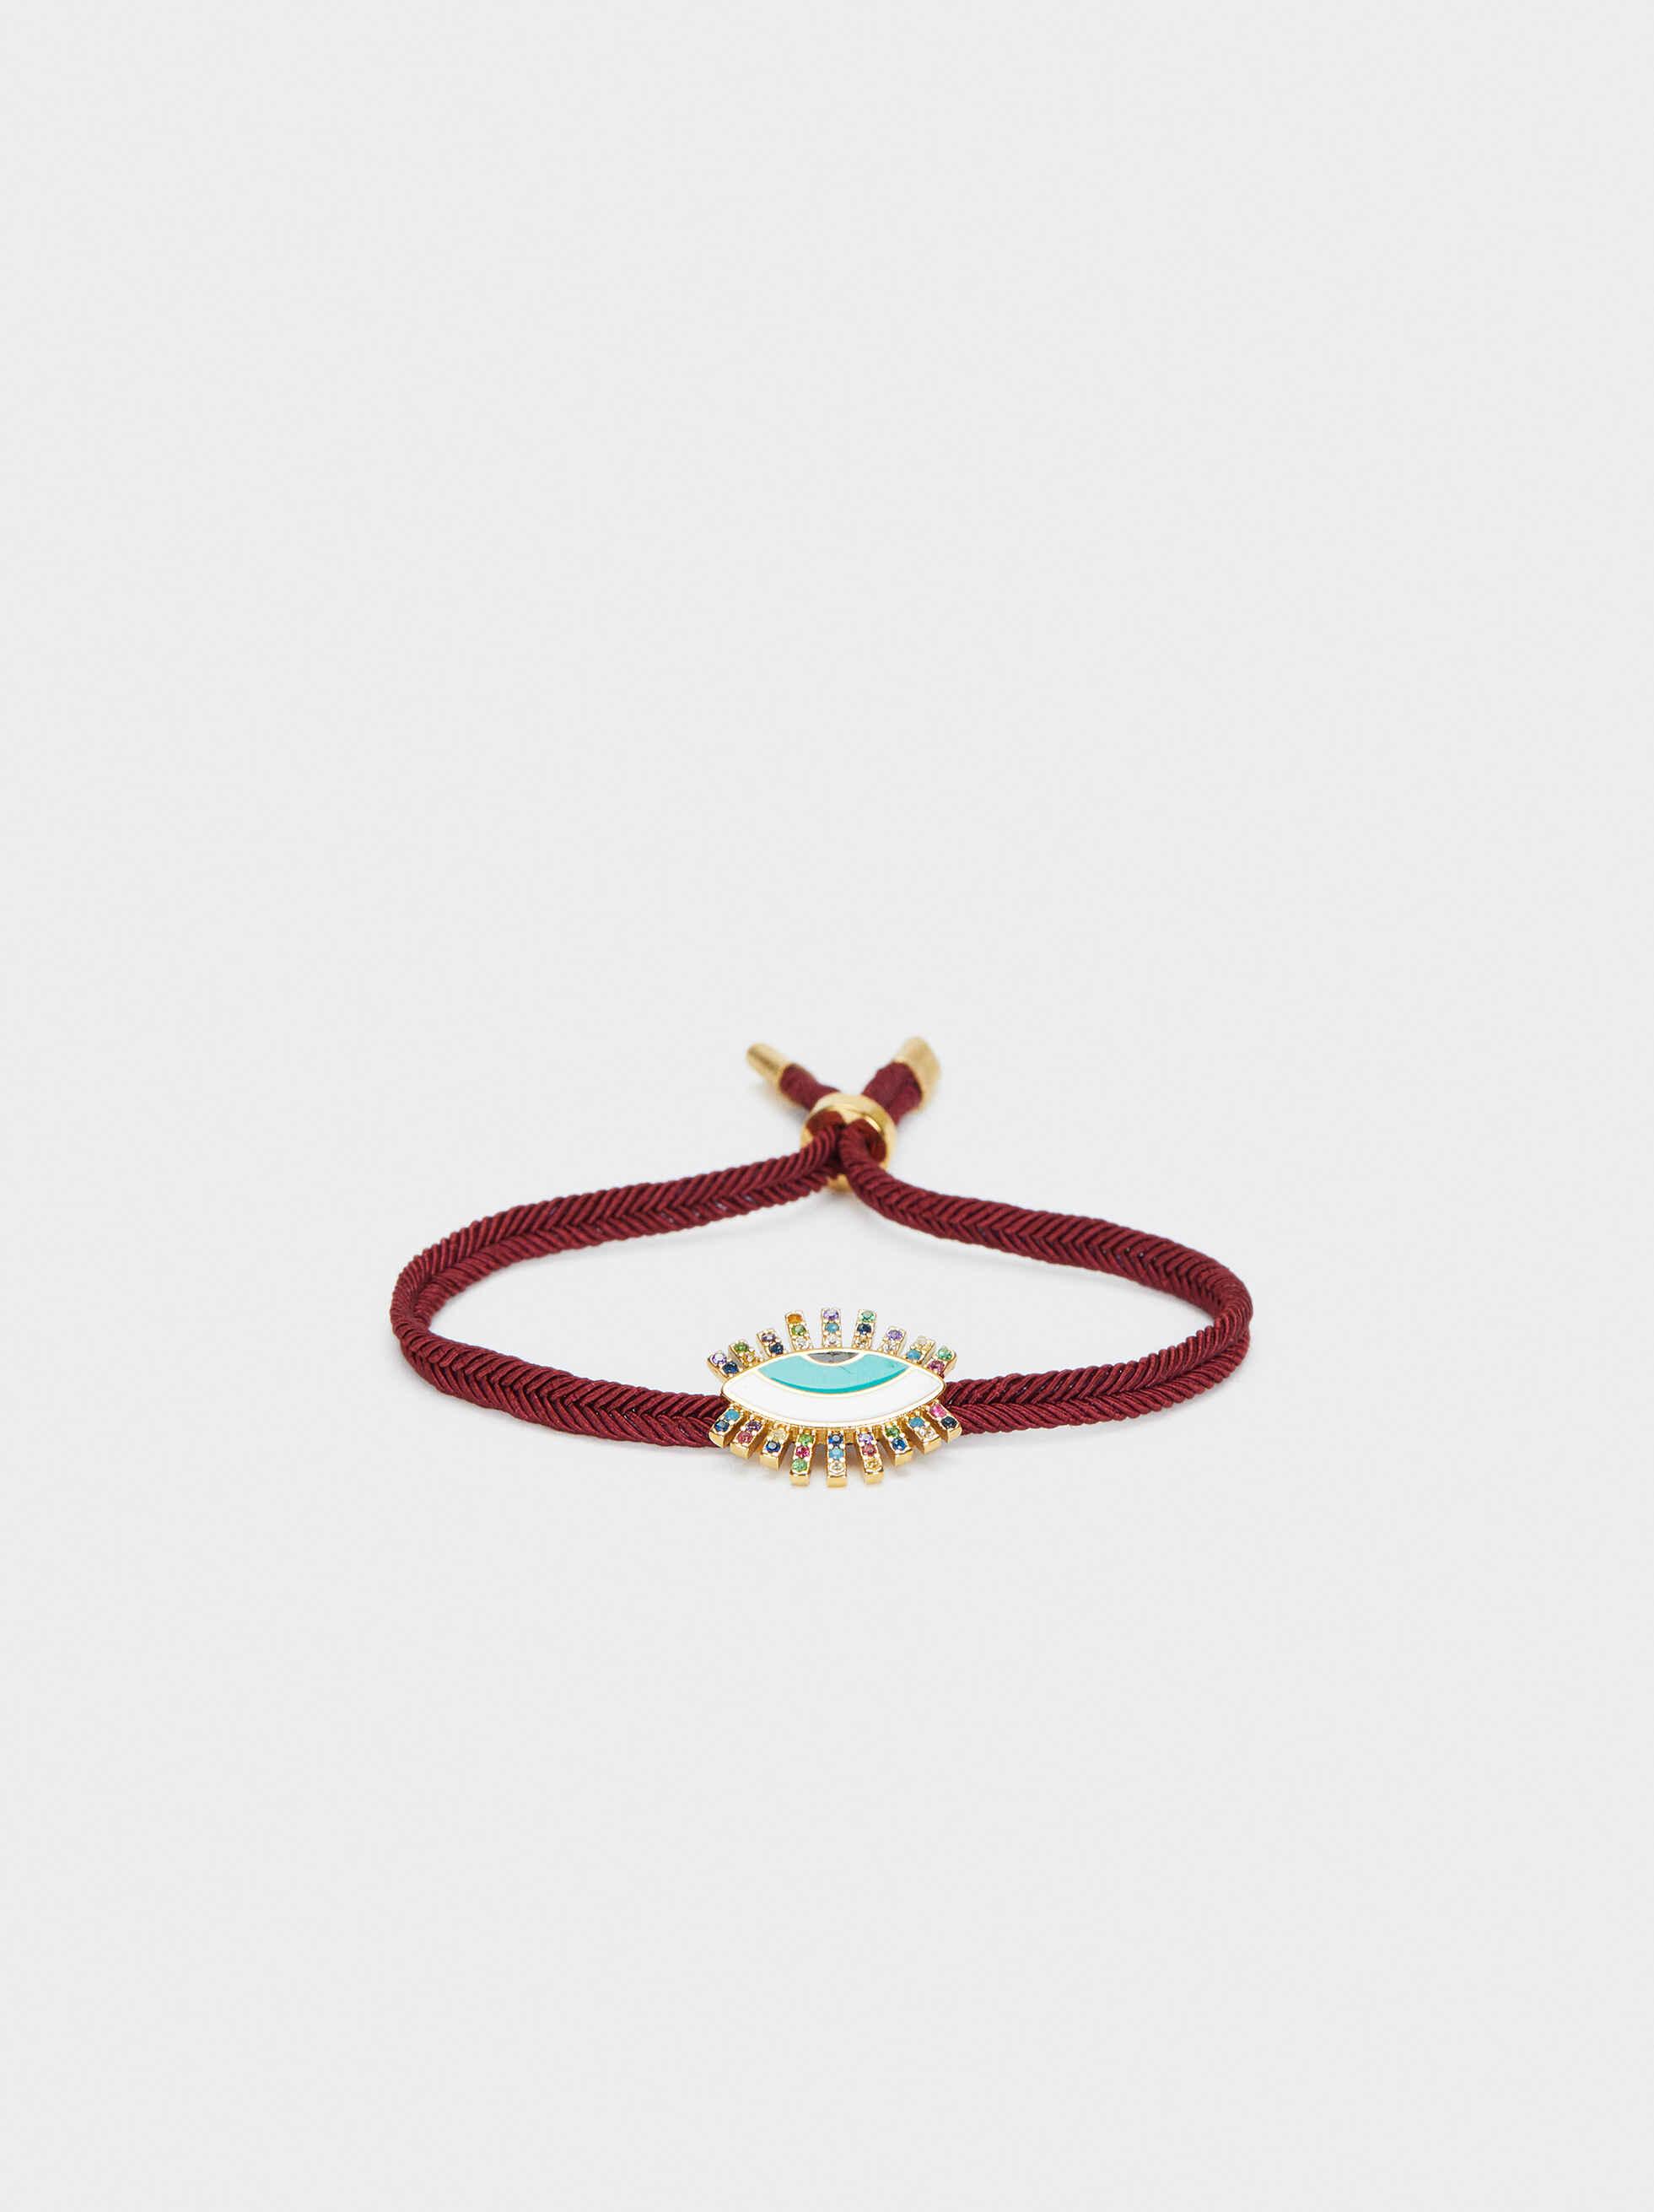 Adjustable Stainless Steel Bracelet With Multicoloured Eye Charm, Bordeaux, hi-res